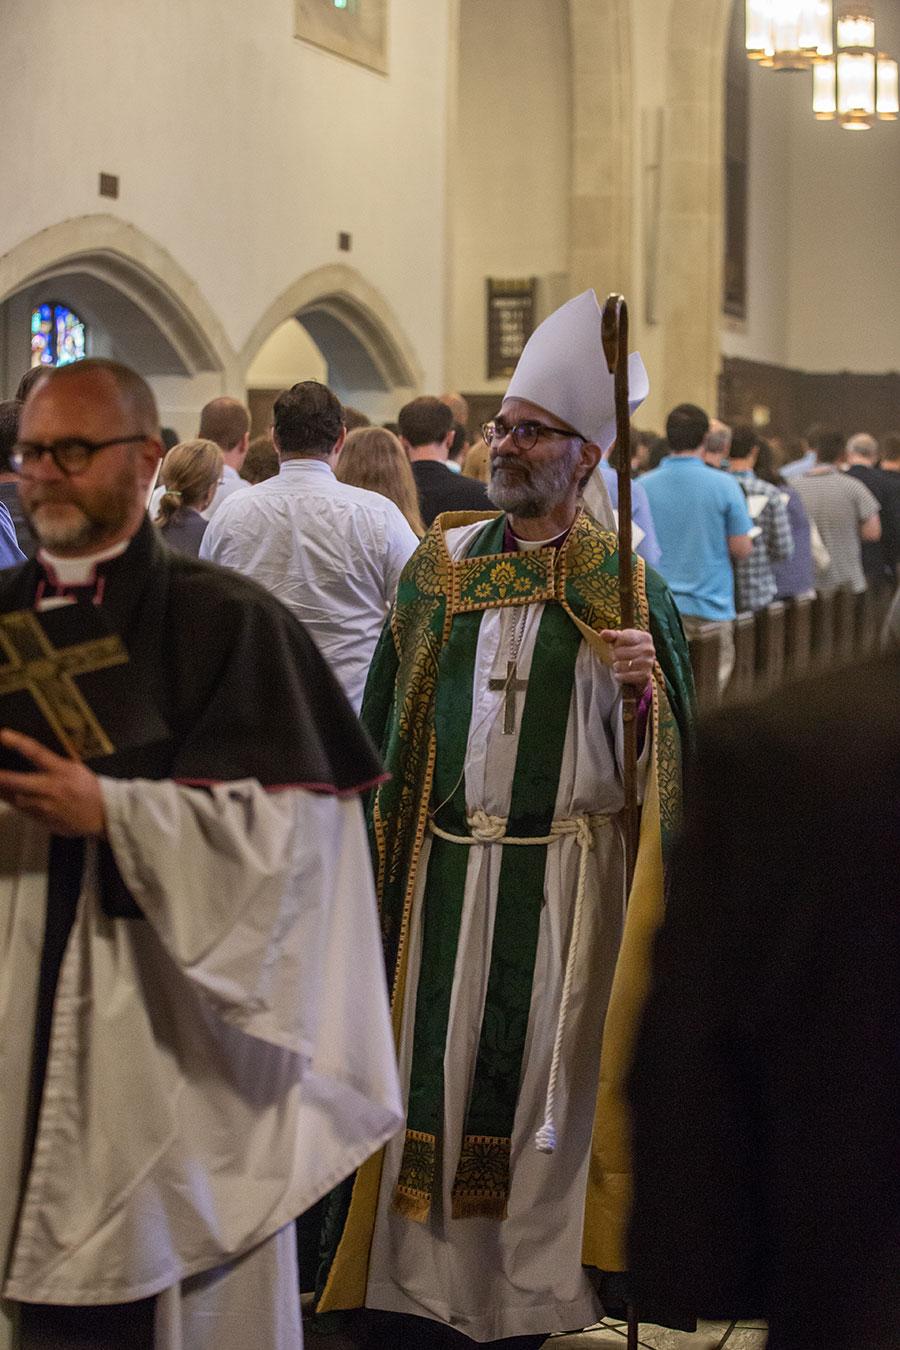 Bishop George Sumner - Diocese of Dallas, Texas